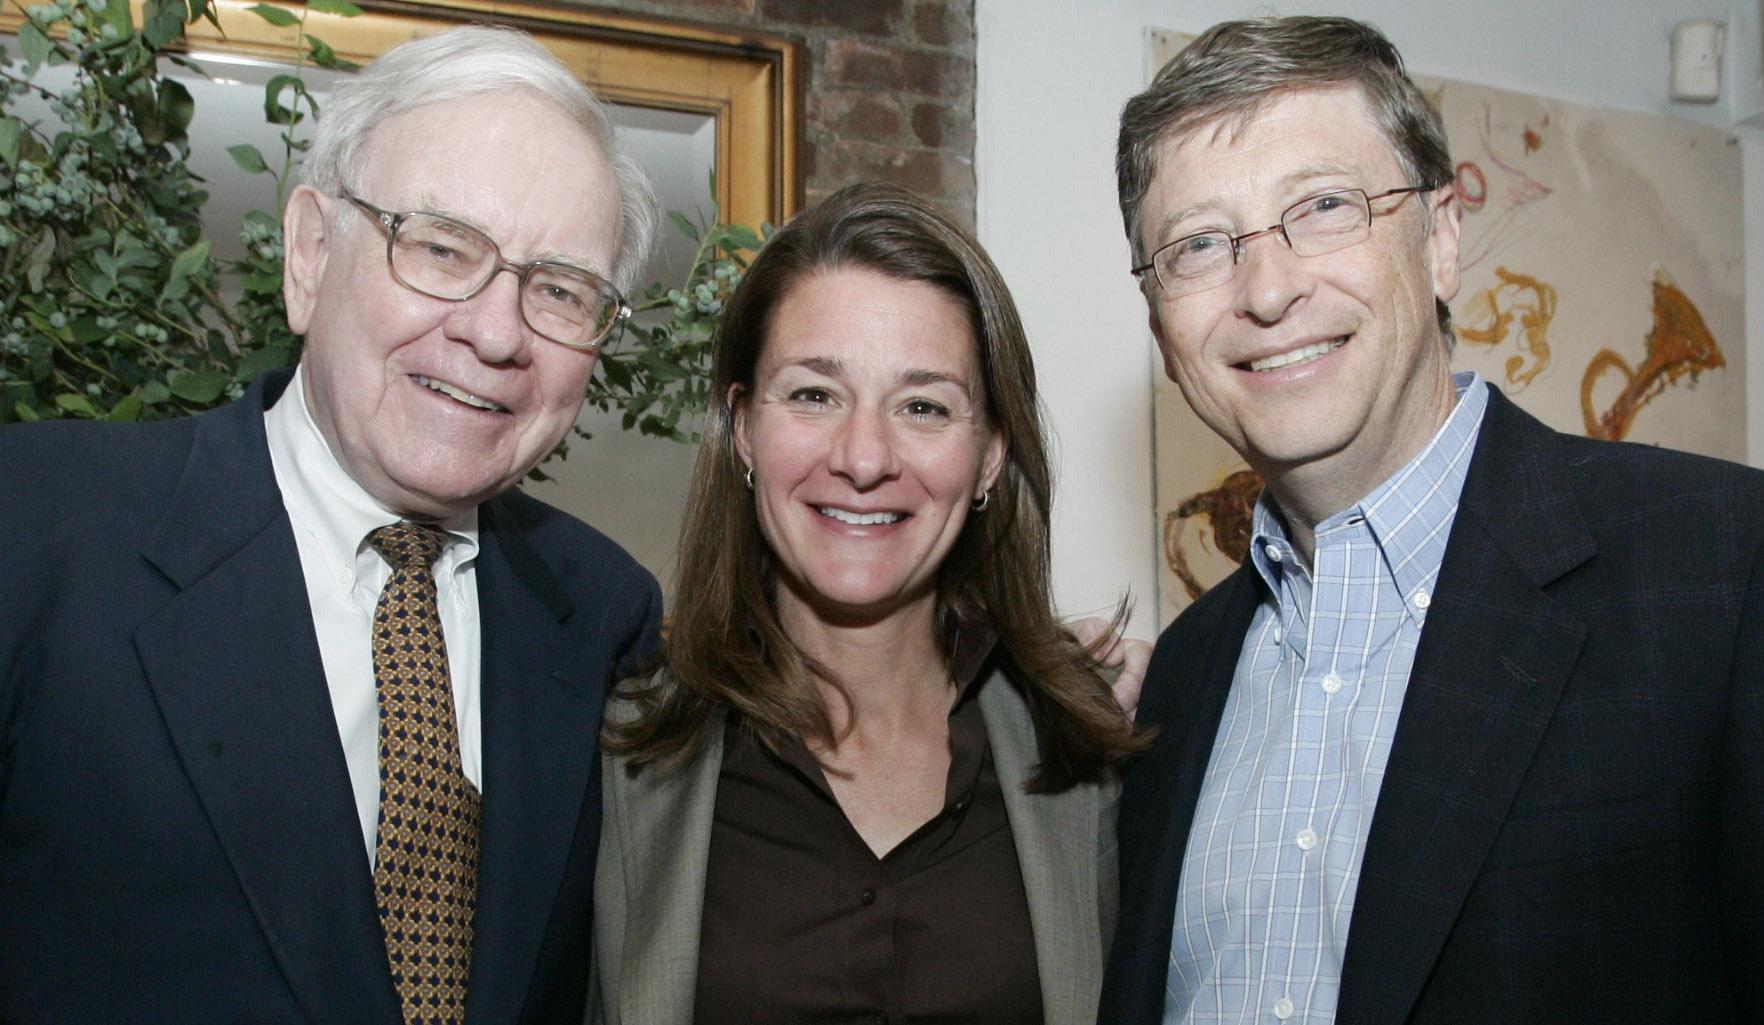 Warren Buffett resigns from Gates Foundation in latest development following Gates divorce